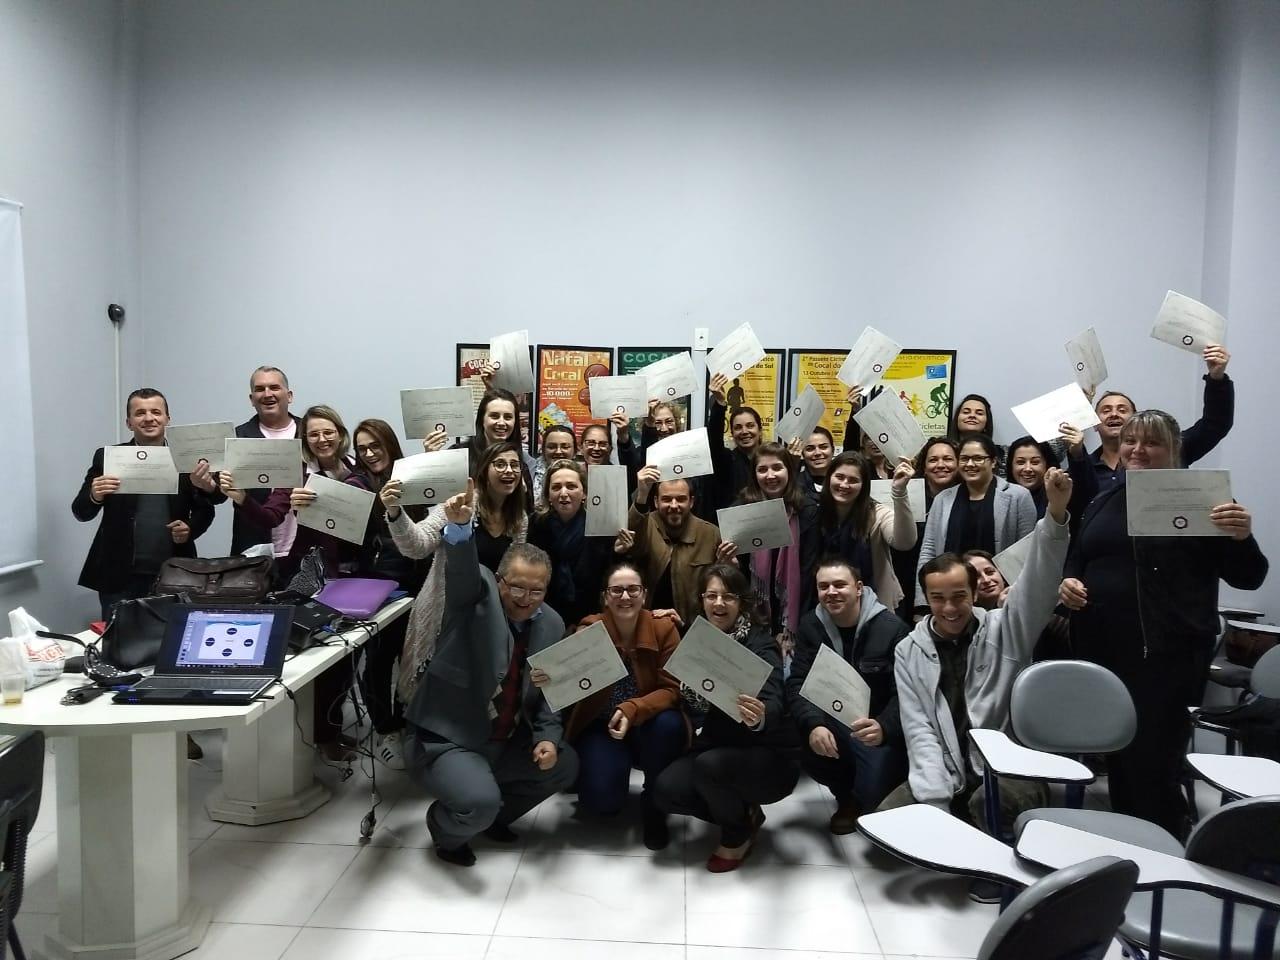 Participantes do Curso de Coaching Gerencial recebem certificados